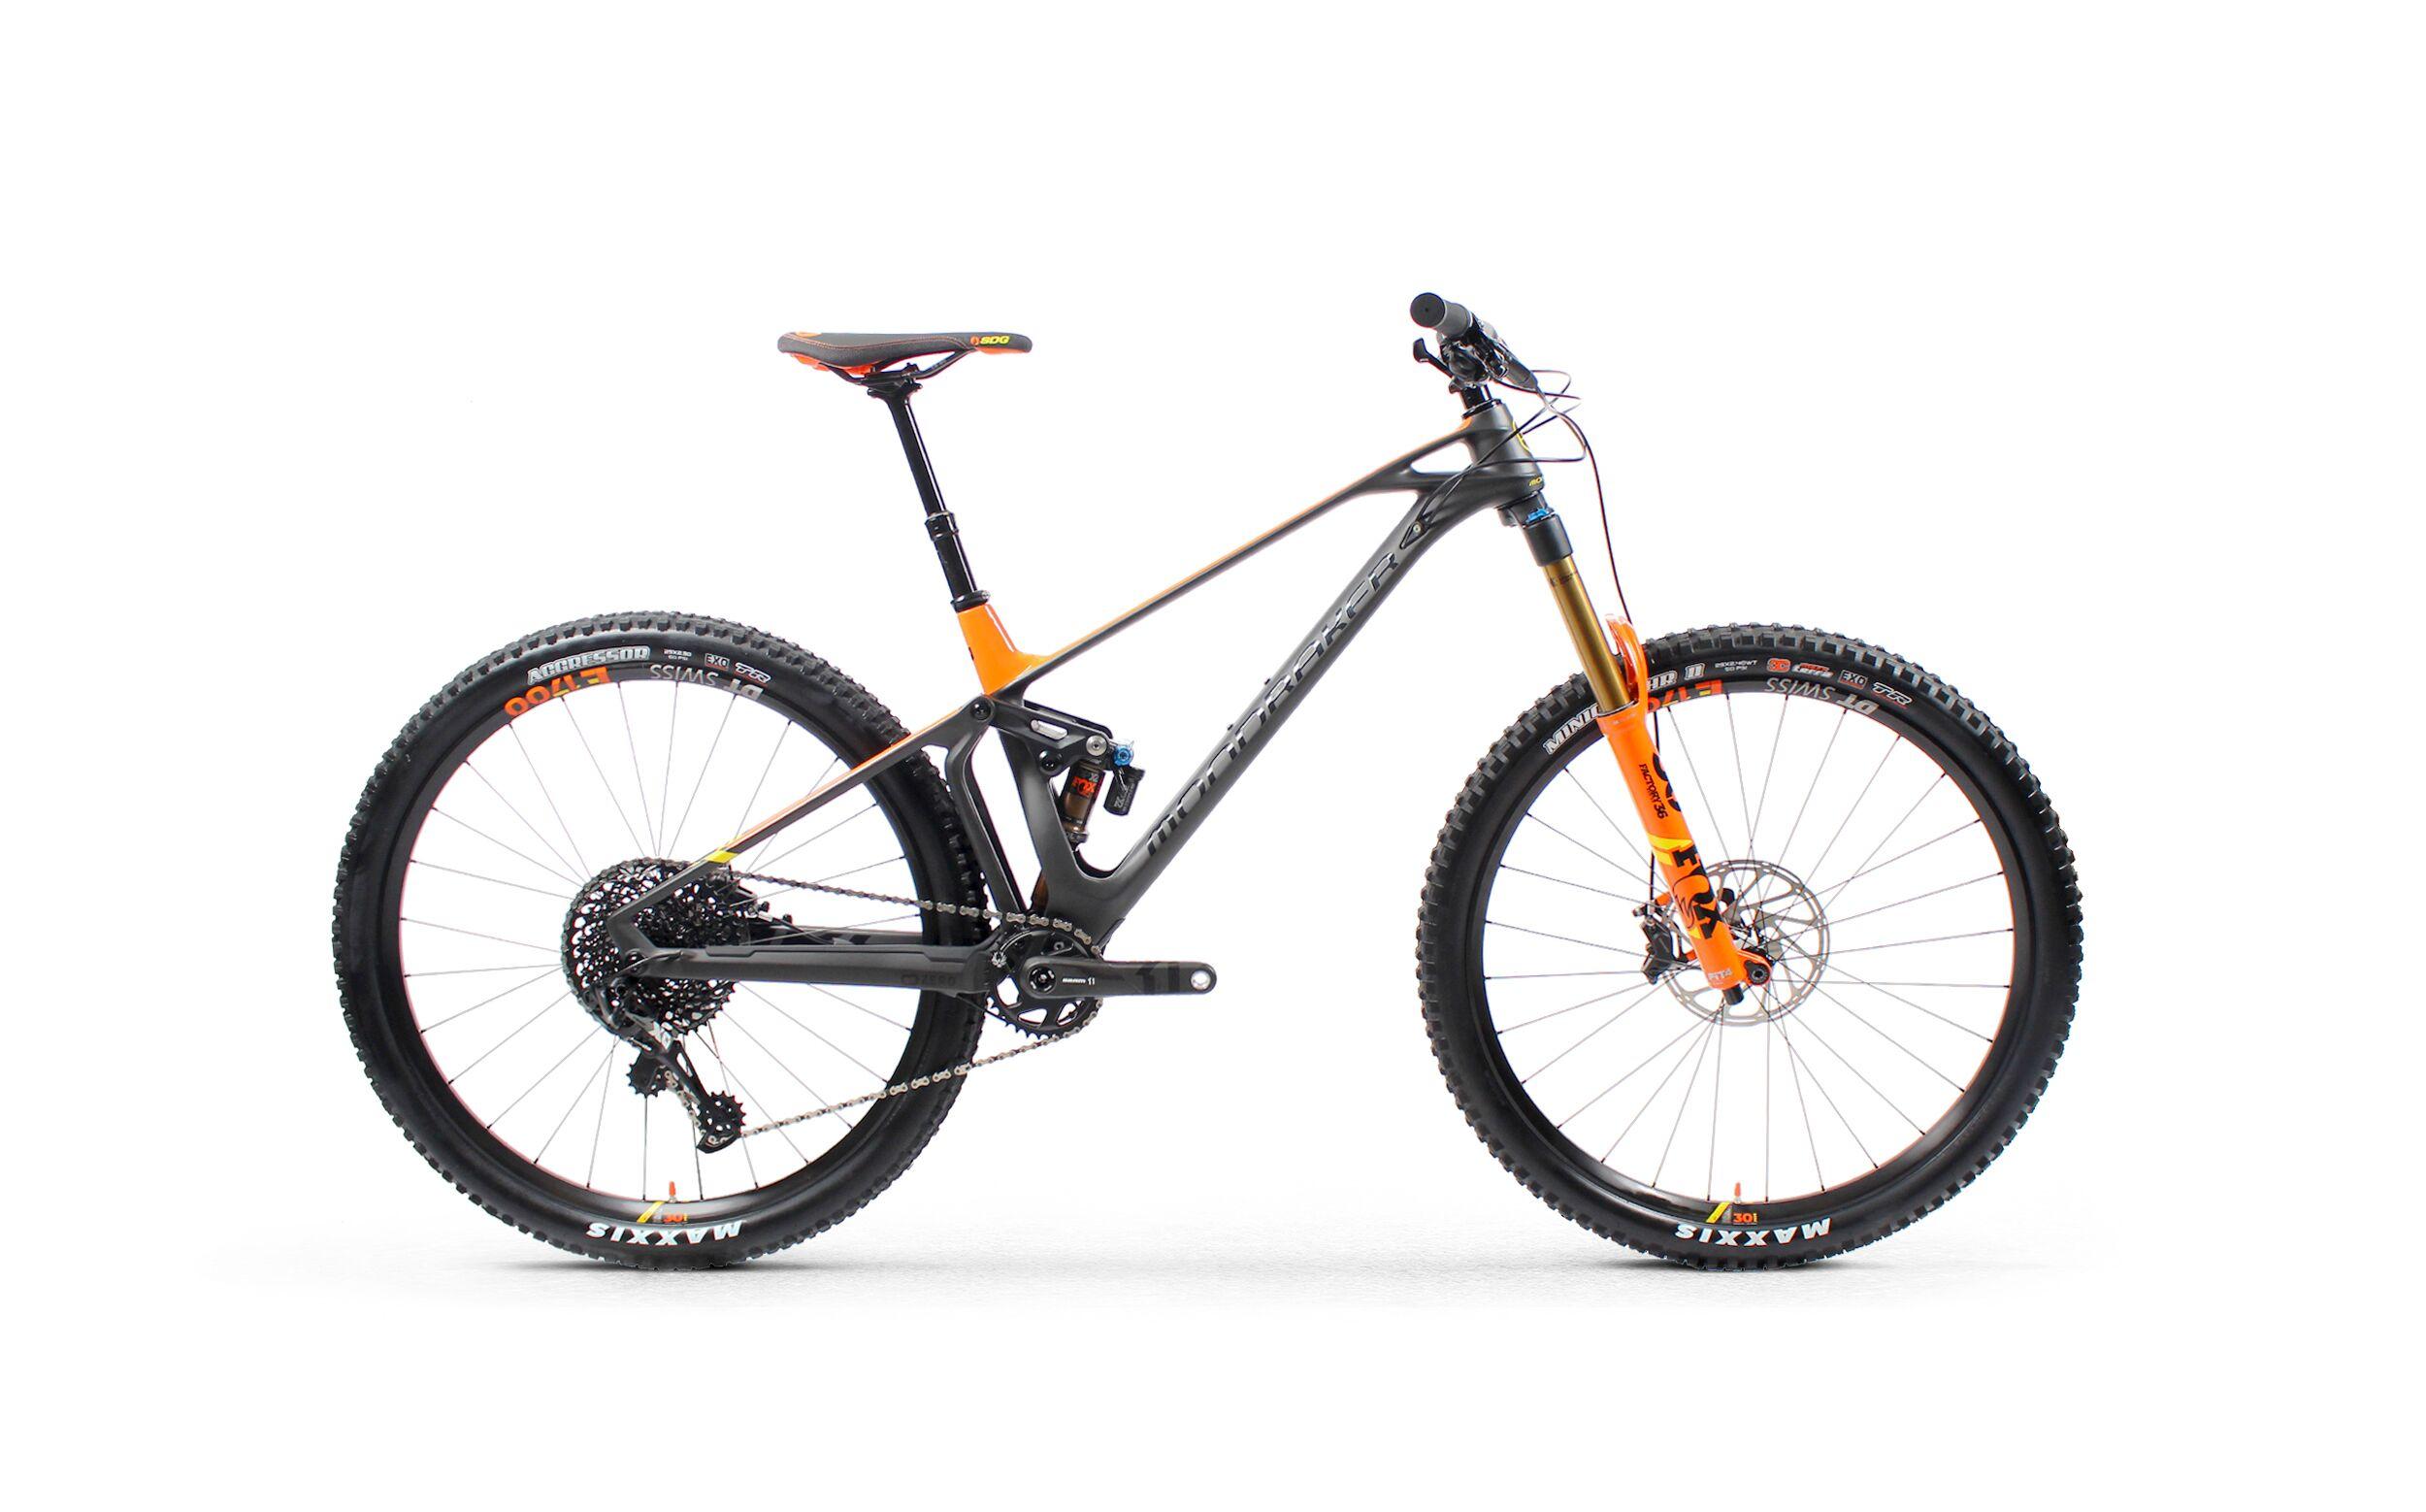 Mondraker Foxy Carbon Rr 29 All Mountain Enduro Bike